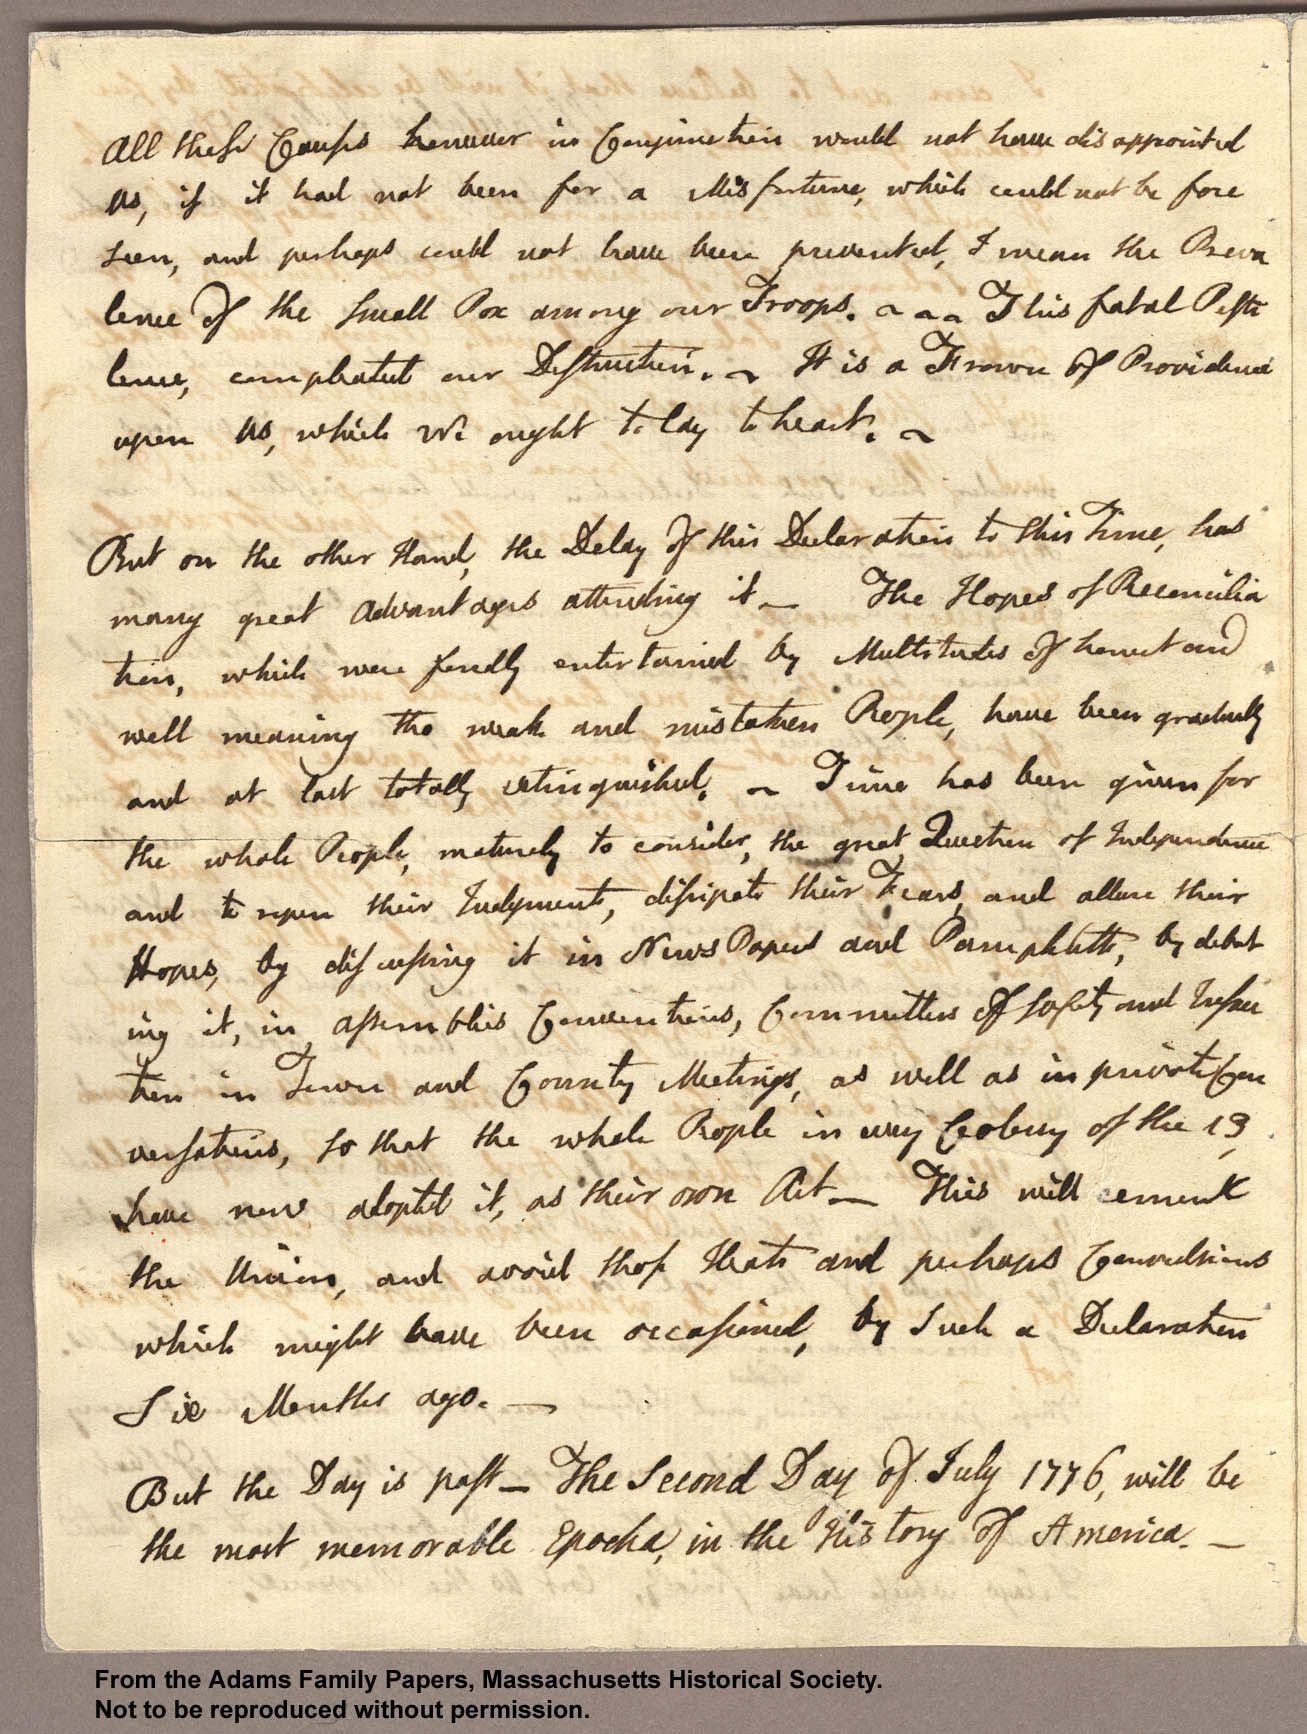 English Class Essay Essay On Abigail Adams  Opinion Of Professionals After High School Essay also Proposal For An Essay Essay On Abigail Adams  Opinion Of Professionals  Essay Helper  A Modest Proposal Essay Topics